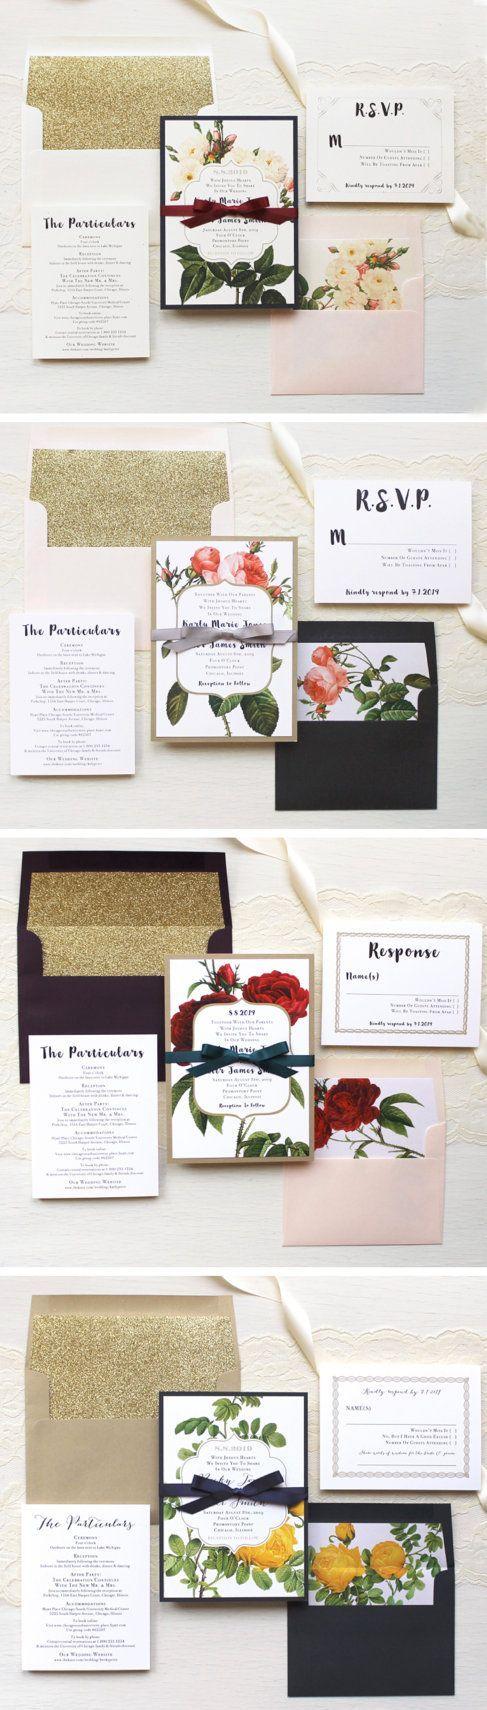 33 Best Wedding Invitations Images On Pinterest Retro Weddings